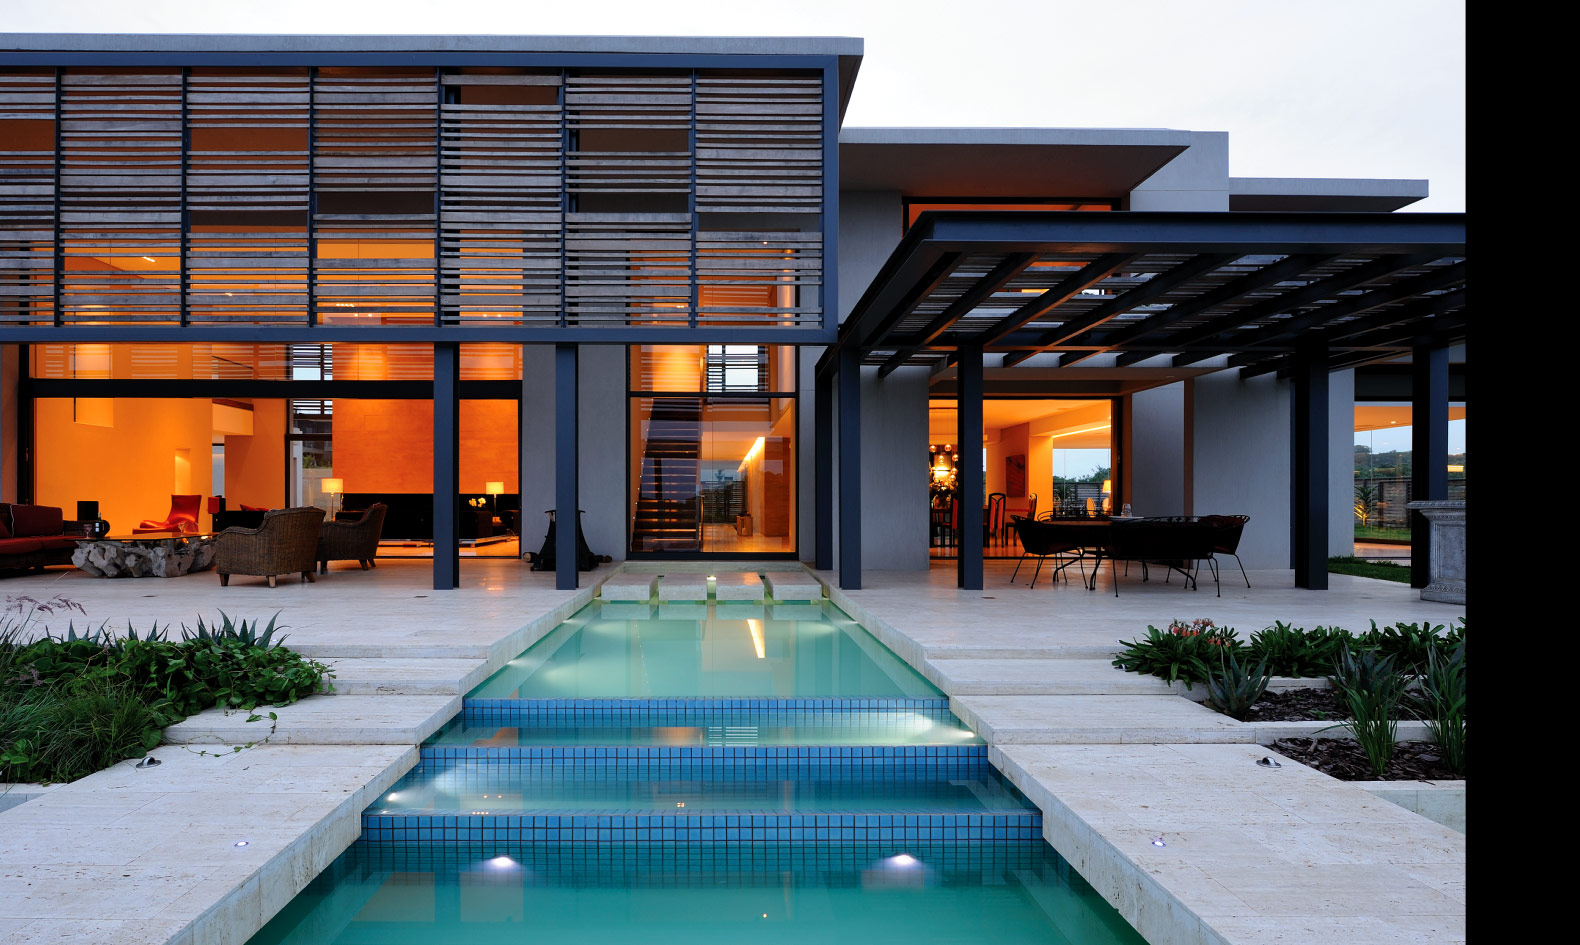 Loveisspeed hawaan estate by saota design for Piscinas minimalistas